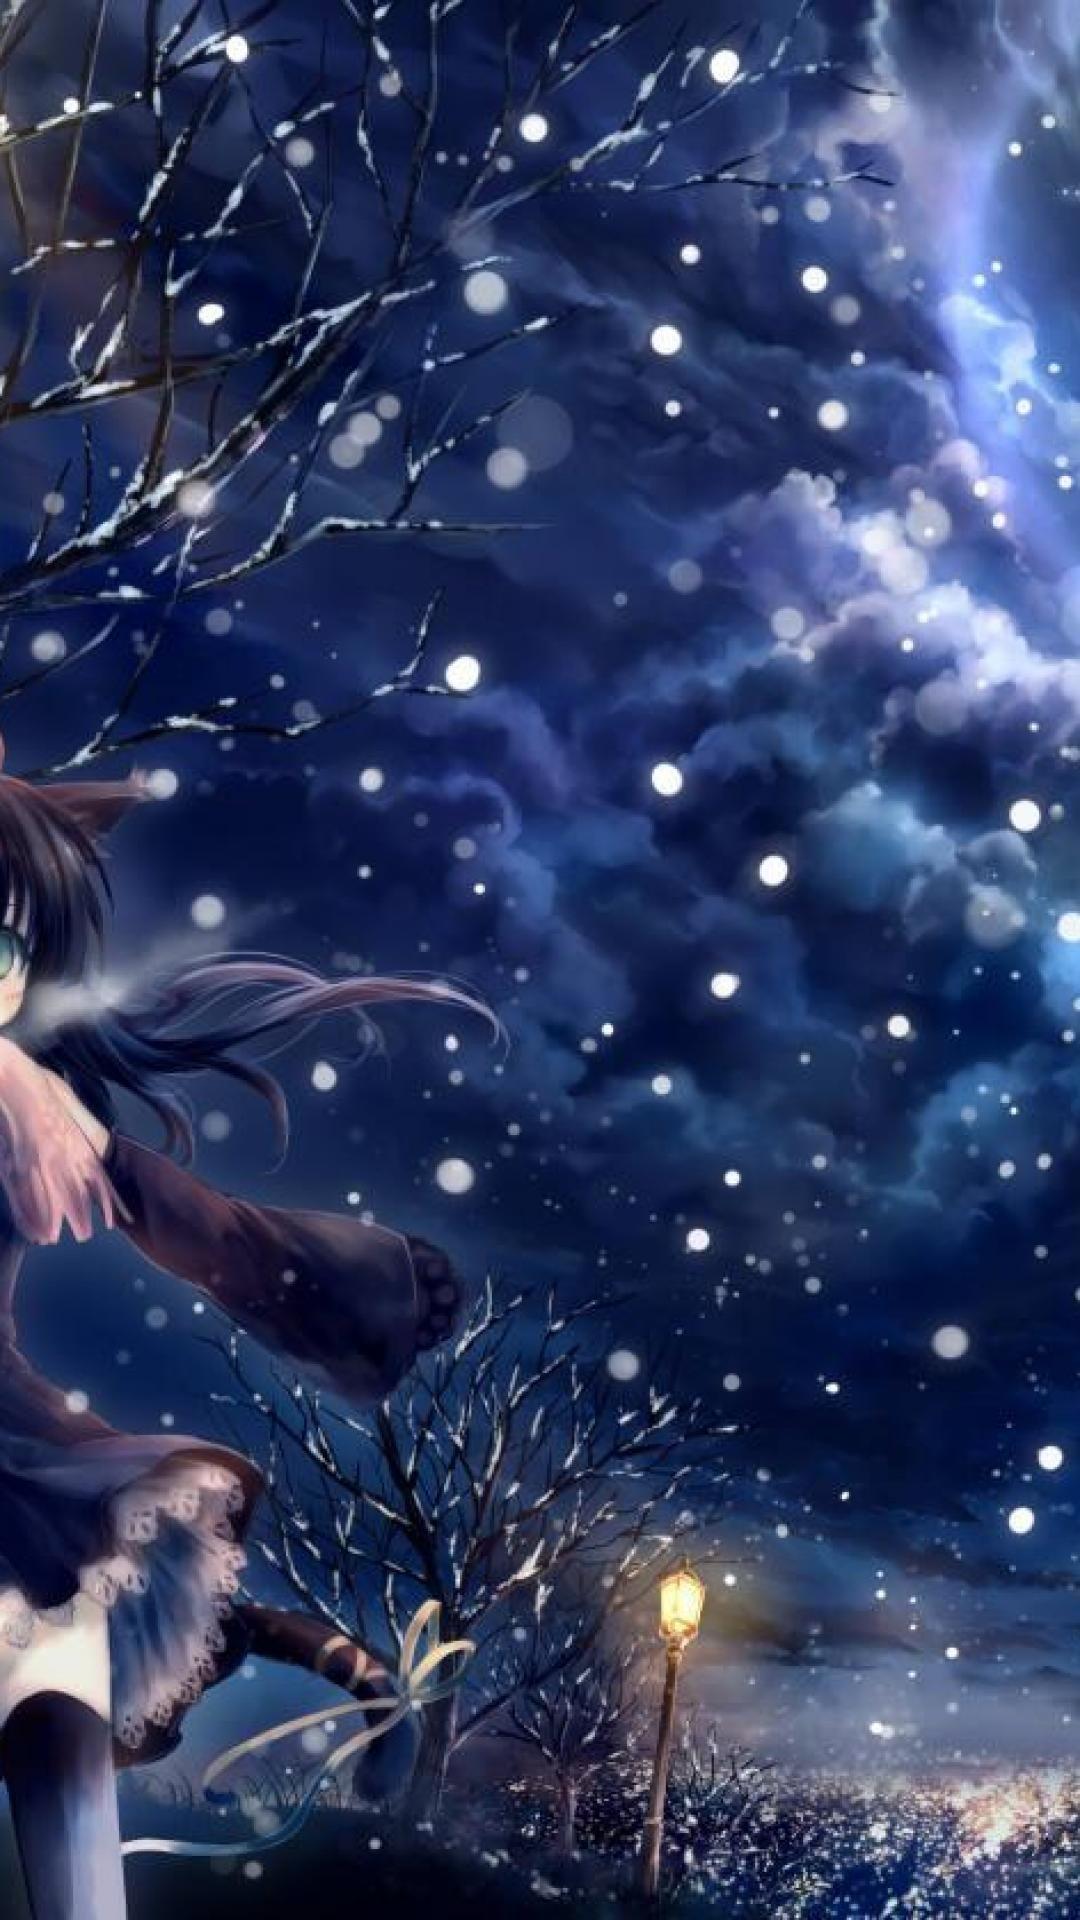 Wallpaper 1366x768 Full Hd Anime